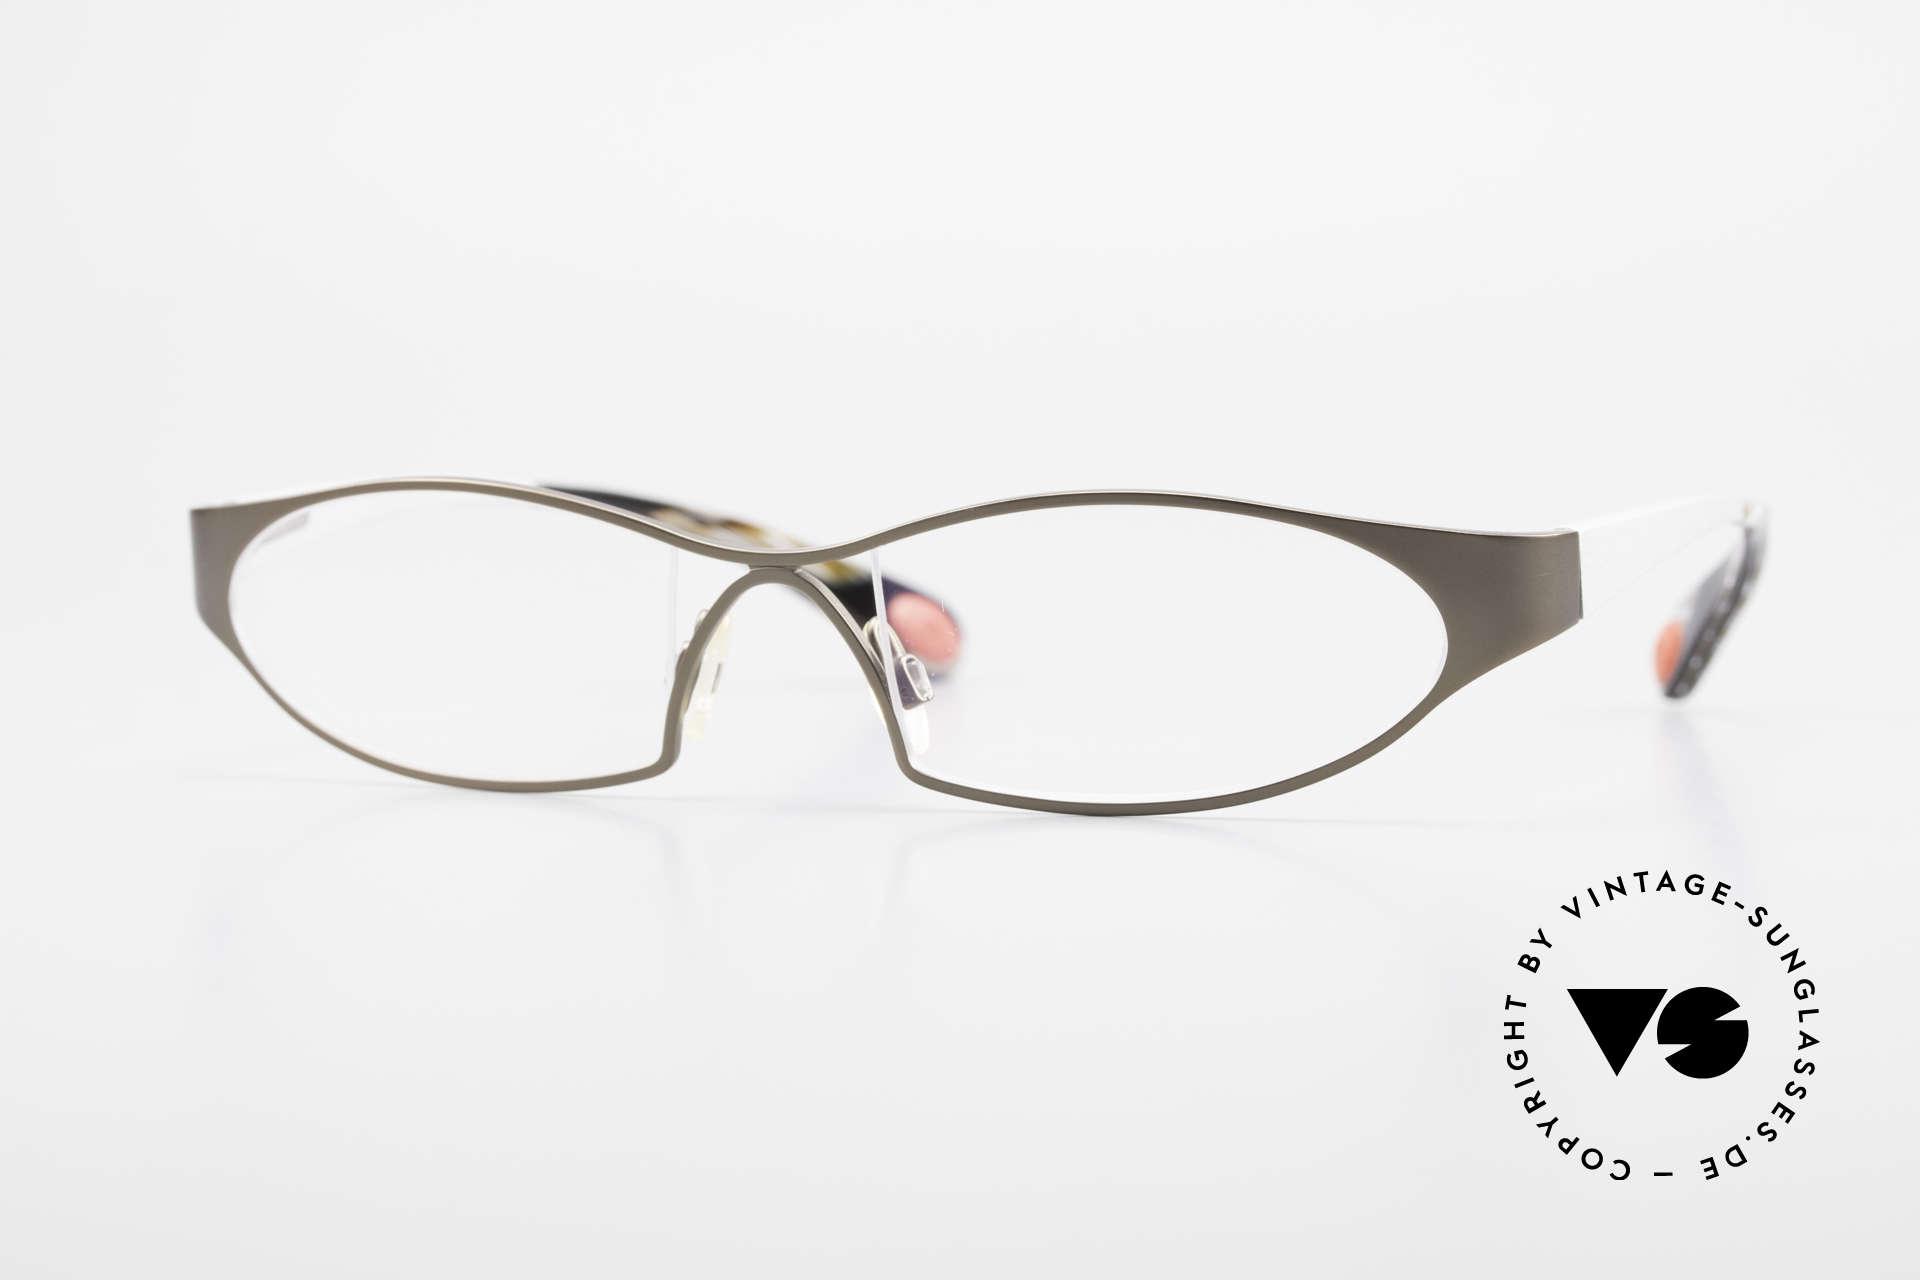 Bugatti 363 Odotype Rare Designer Frame For Men, original BUGATTI high-tech eyeglass-frame, Made for Men